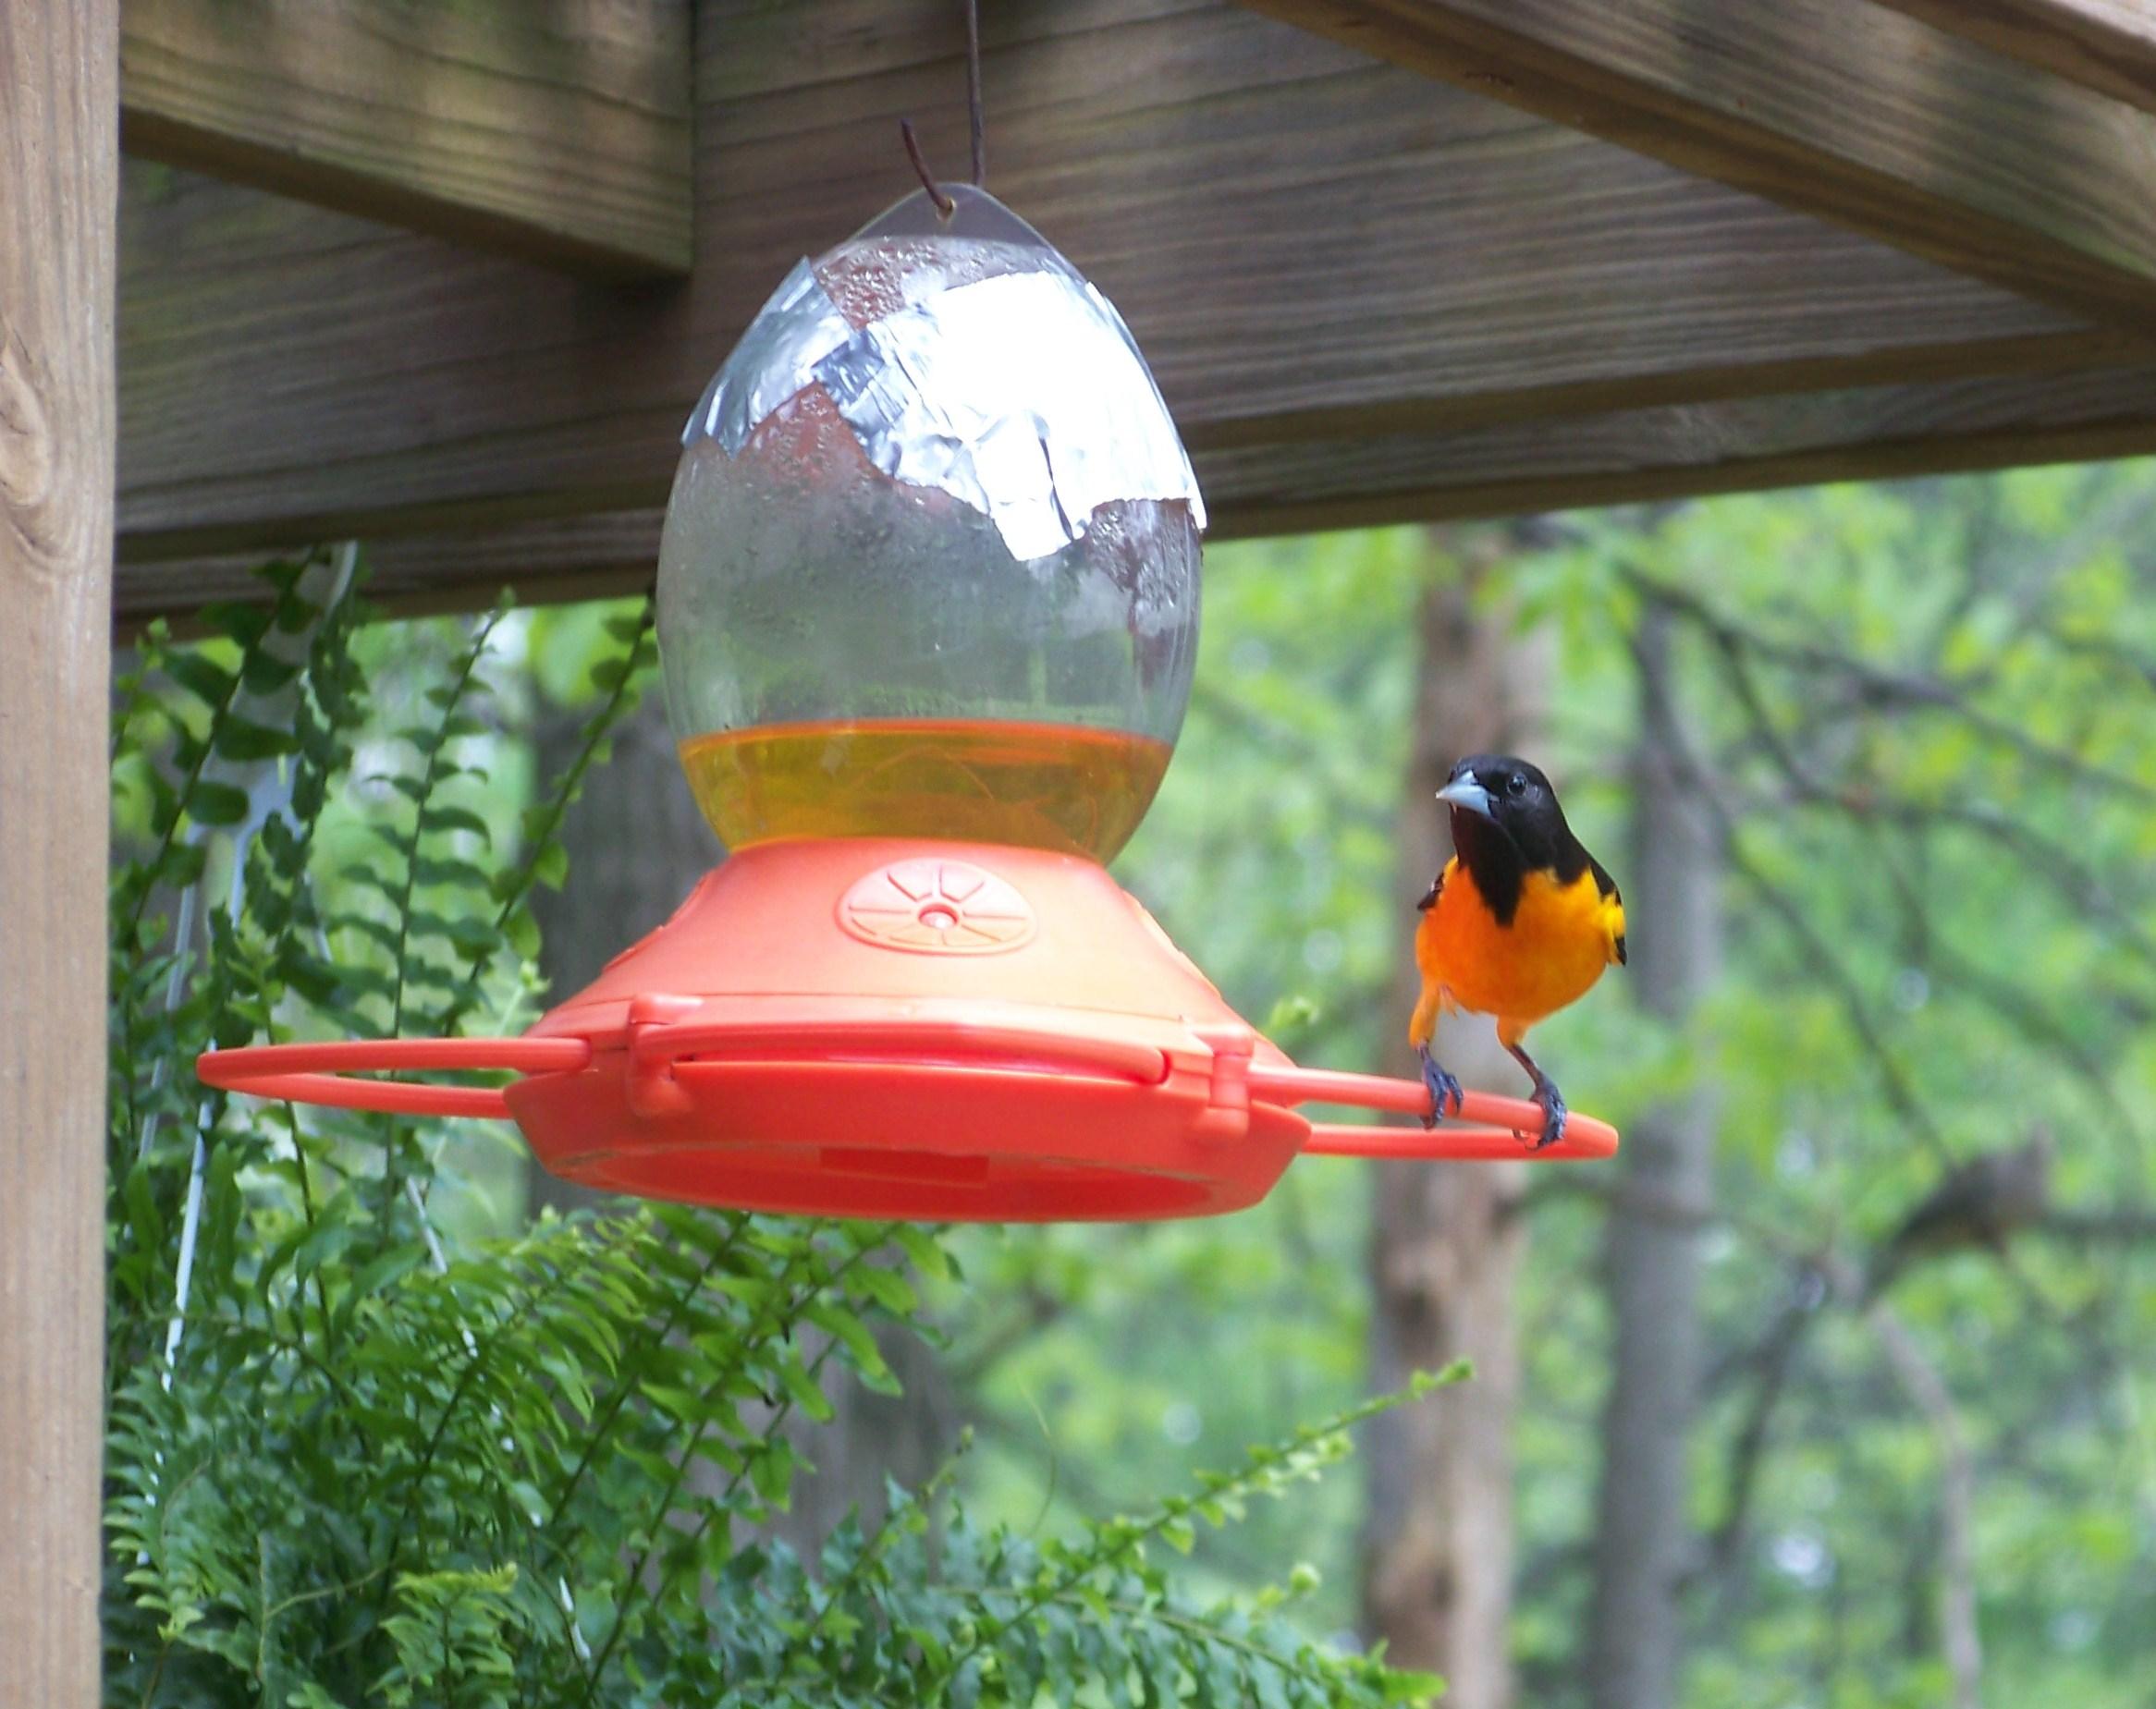 diy jelly s pin blog carolina or oriole wren mason suet rebecca jar bird best the gardens feeder